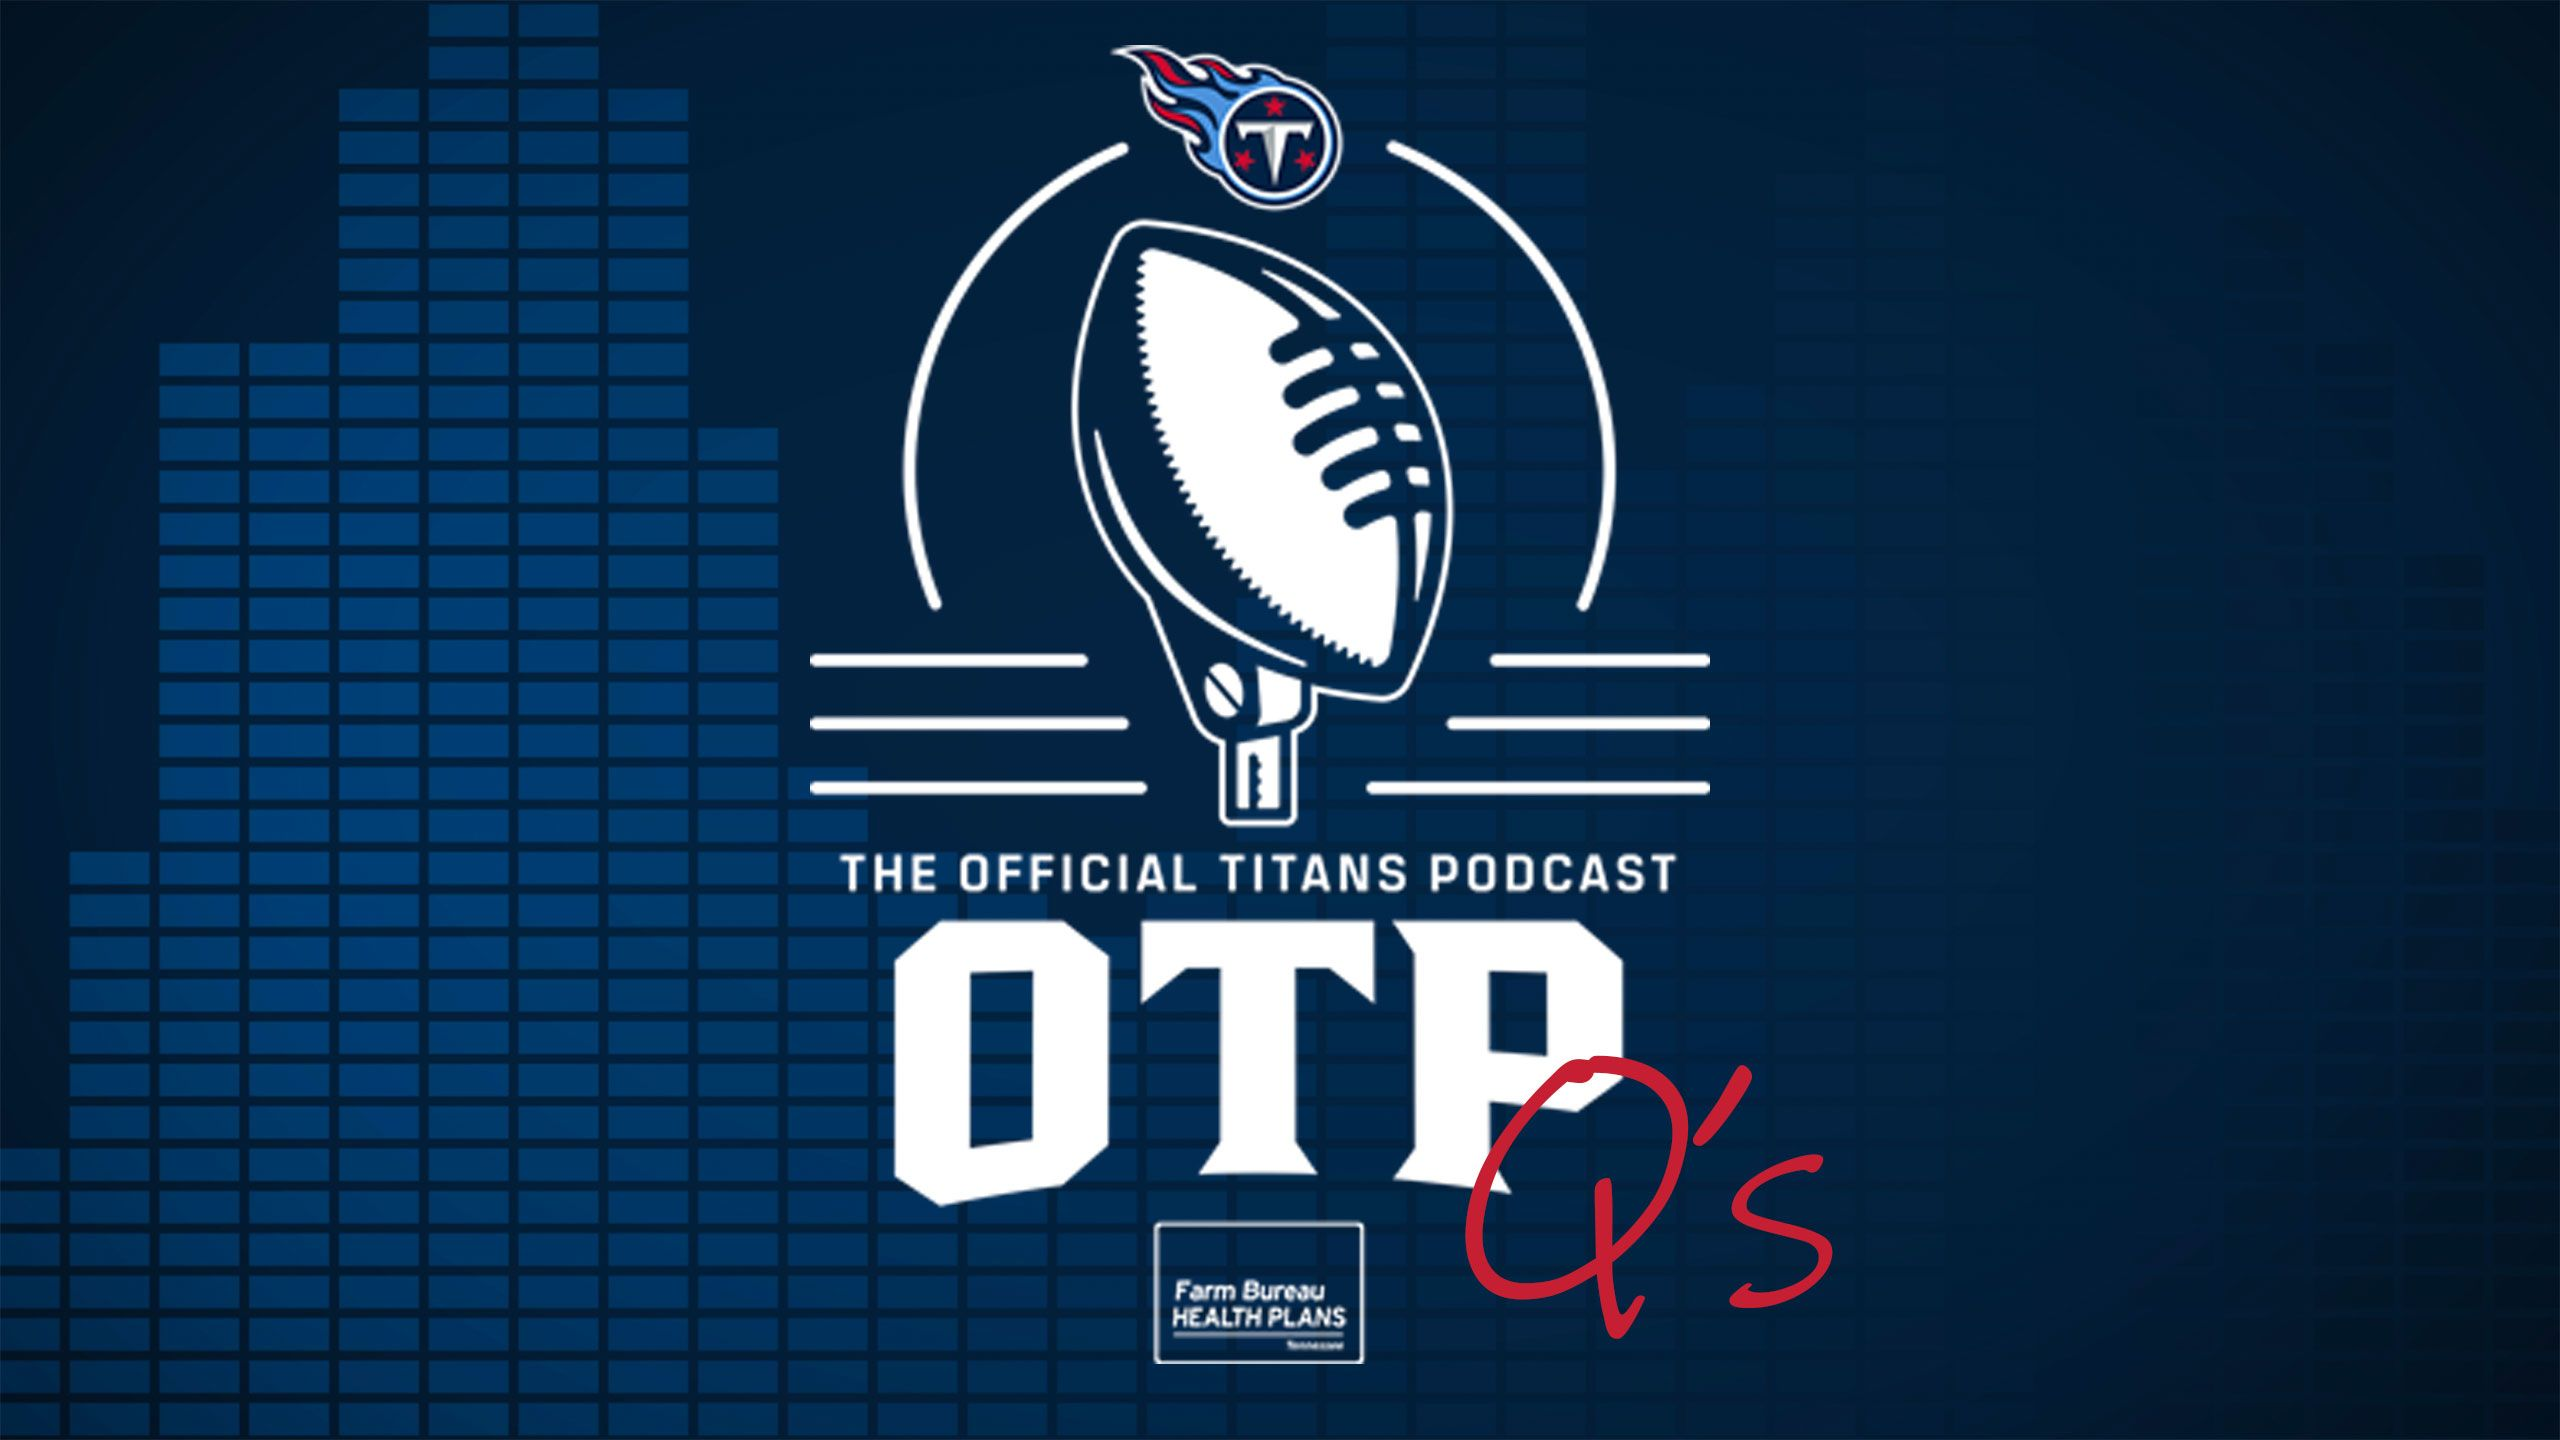 The OTPQs